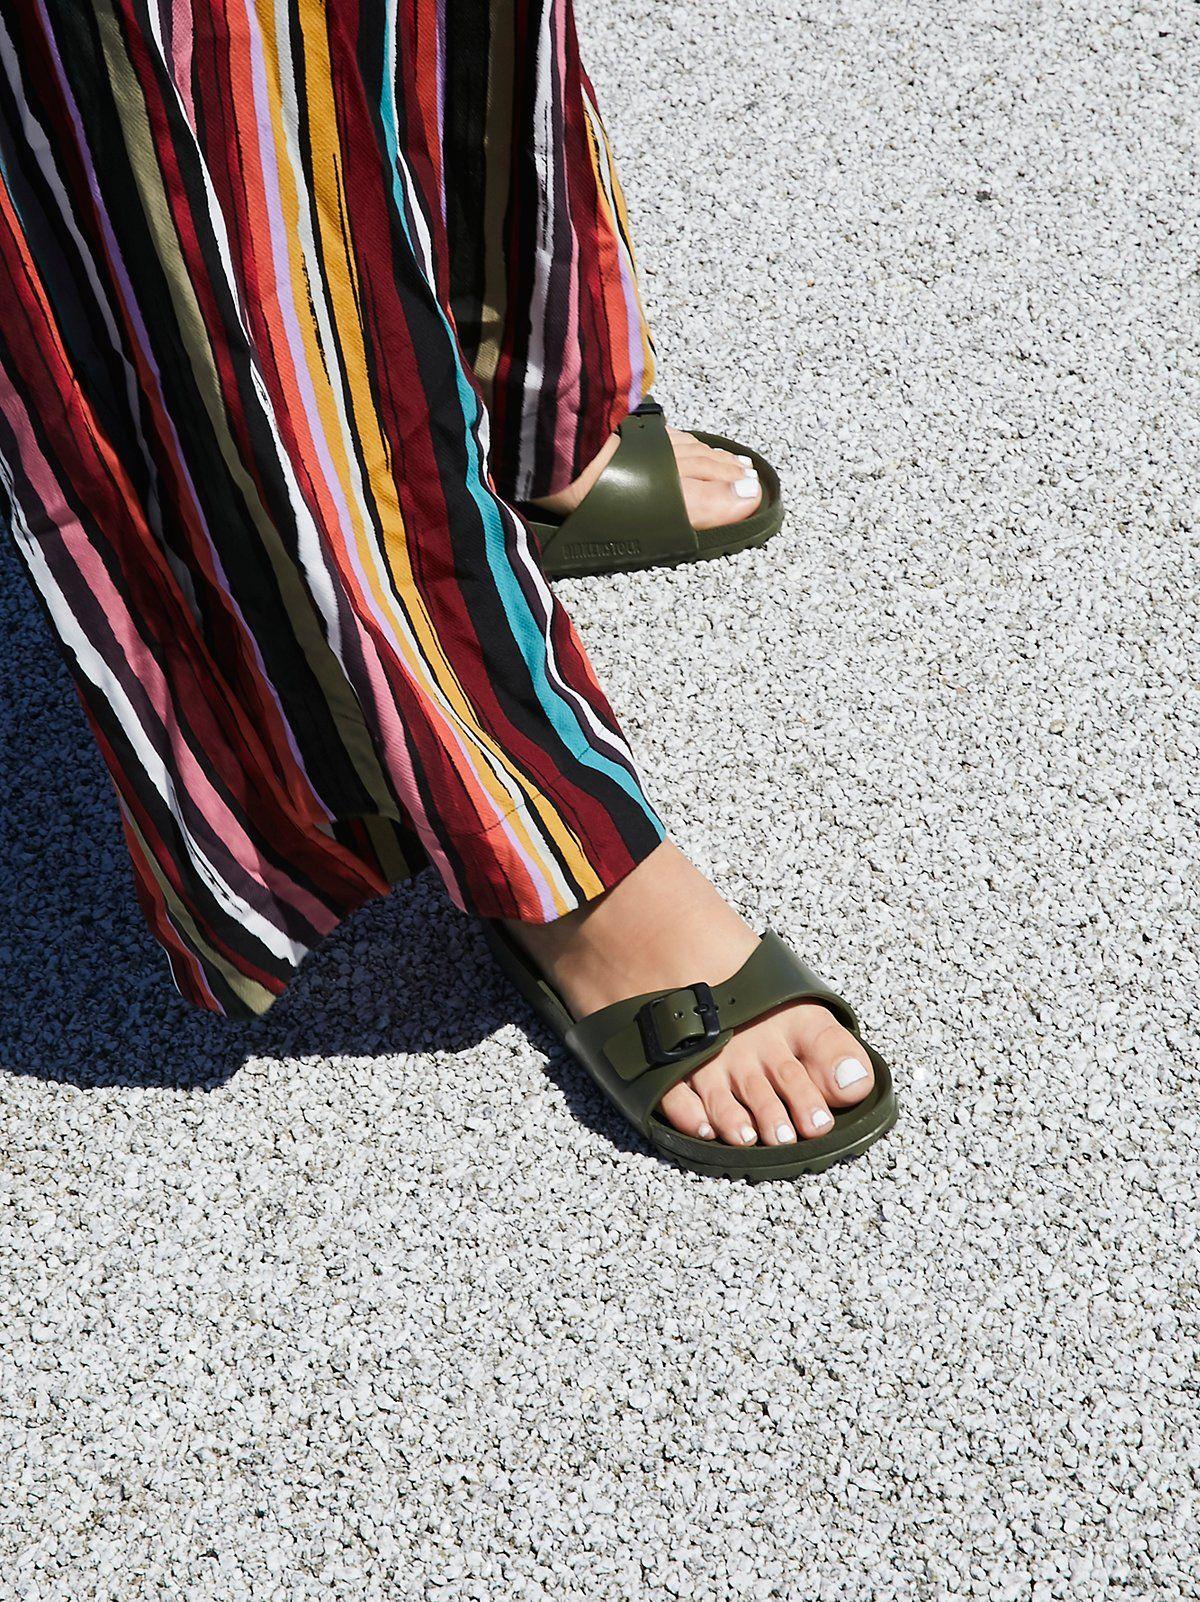 4102051b2 EVA Madrid Birkenstock | Slip-on Birkenstock sandals featuring an EVA  footbed and outsole.